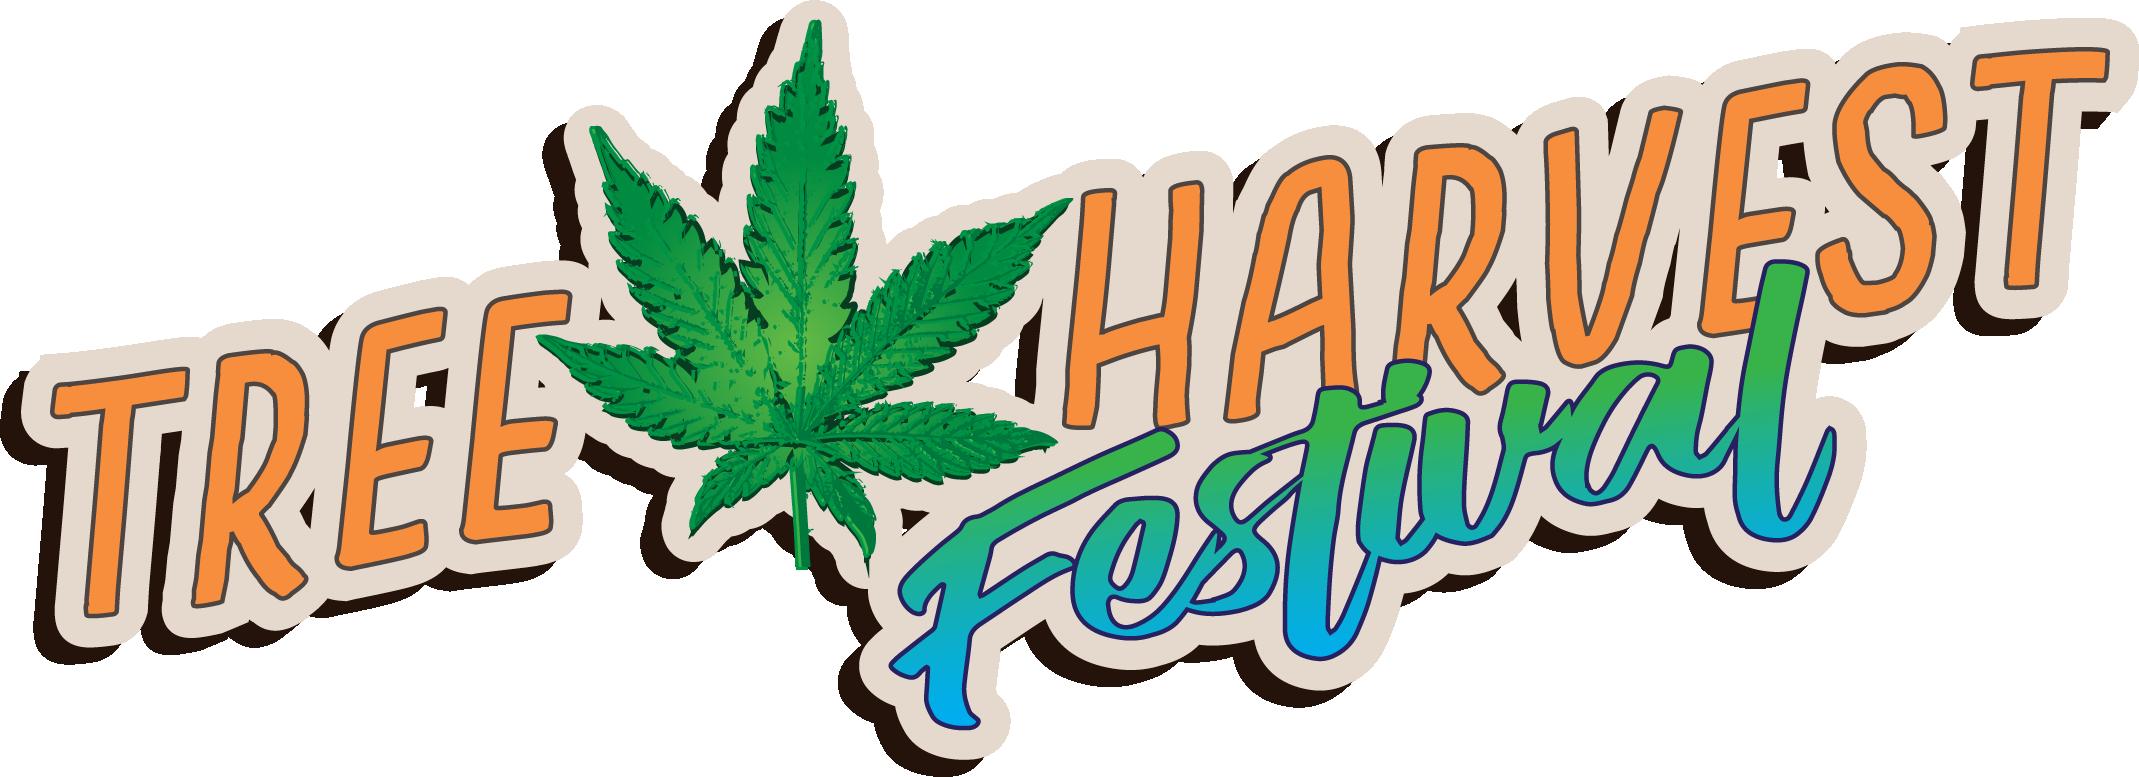 Tree Harvest Festival